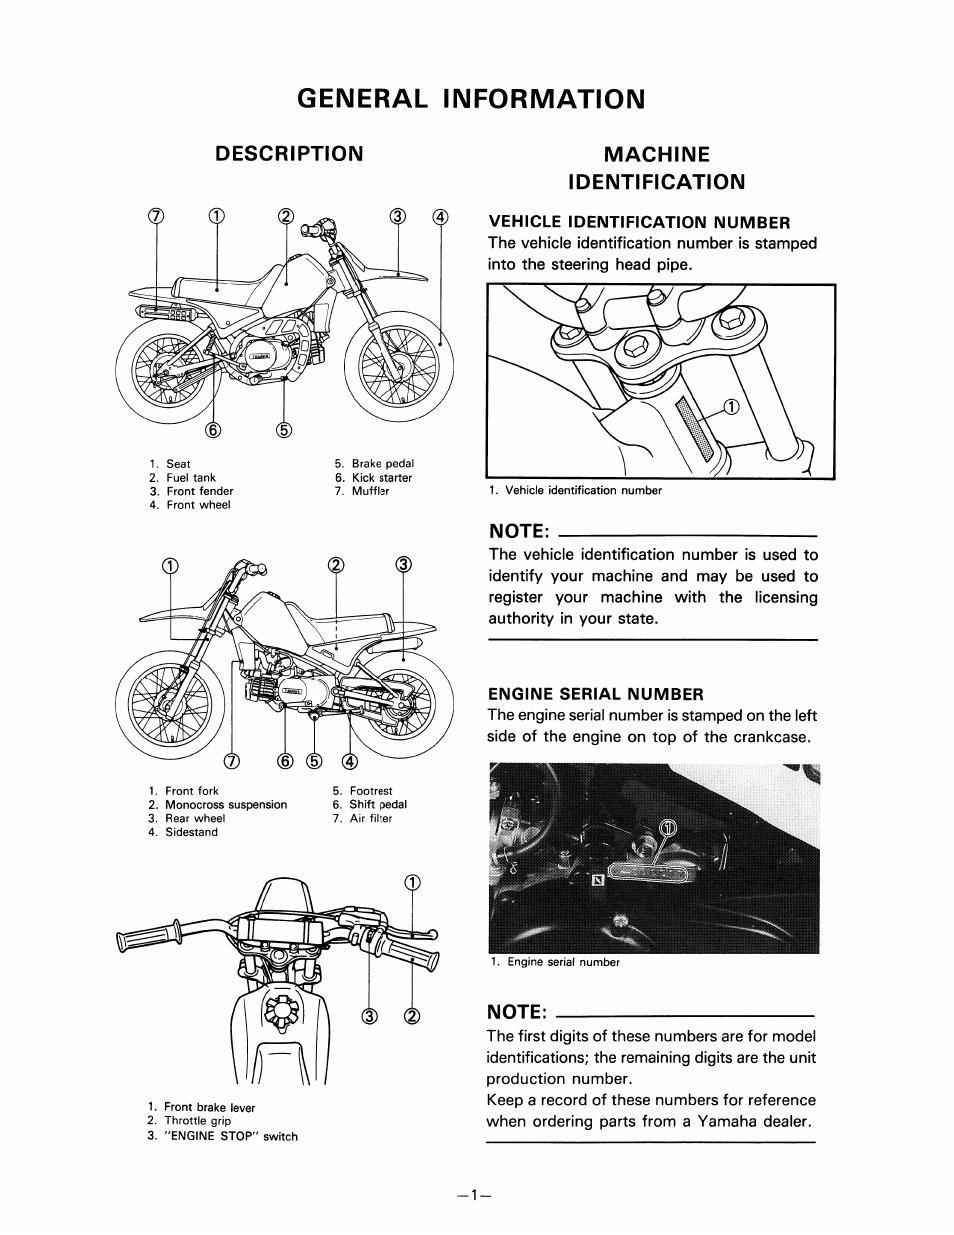 General information, Machine, Identification | Yamaha pw80 User ...